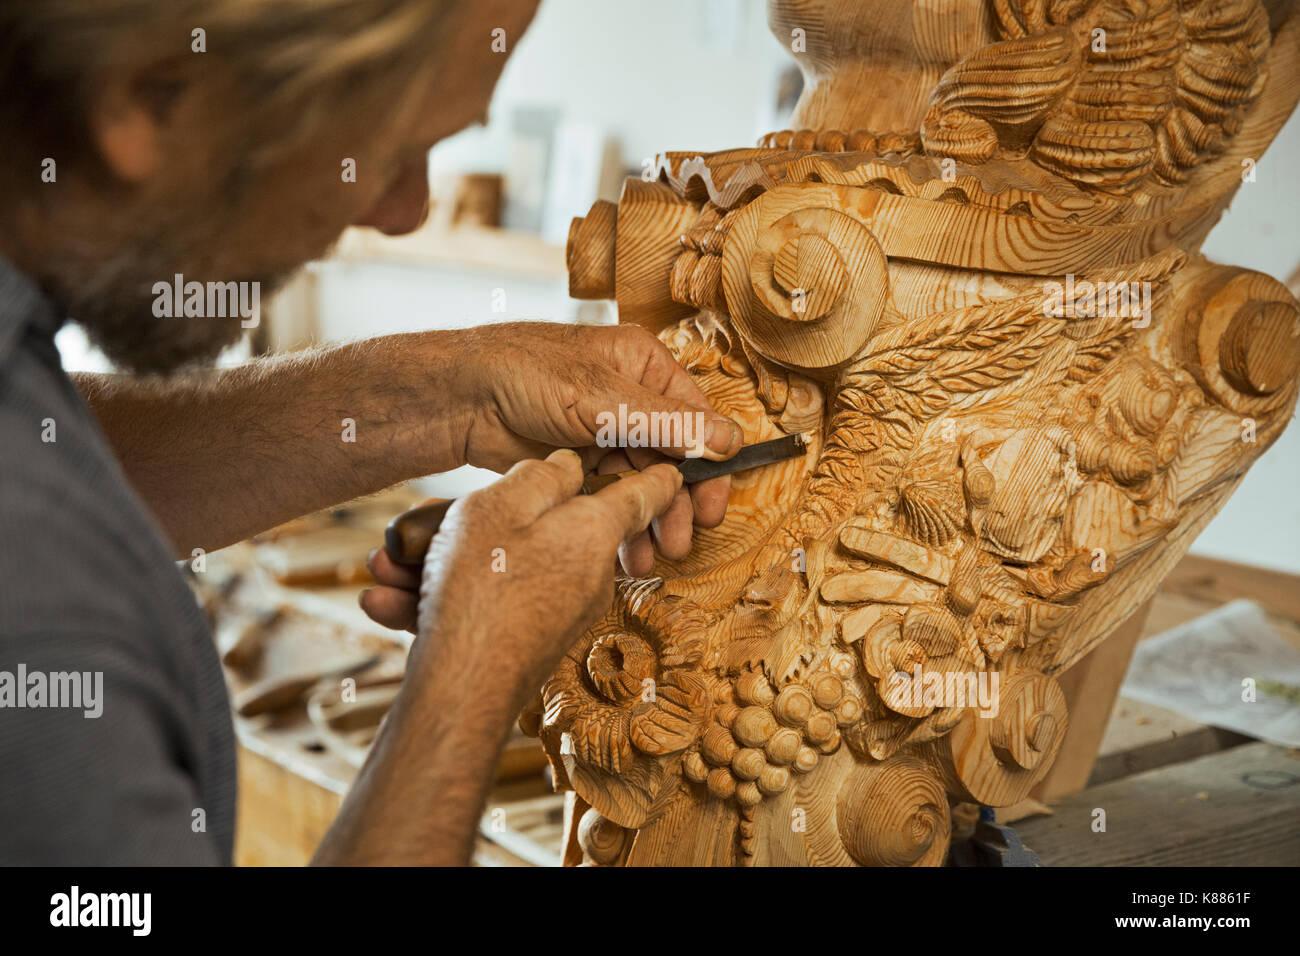 Ships Figurehead Carving Stock Photos & Ships Figurehead Carving Stock Images - Alamy